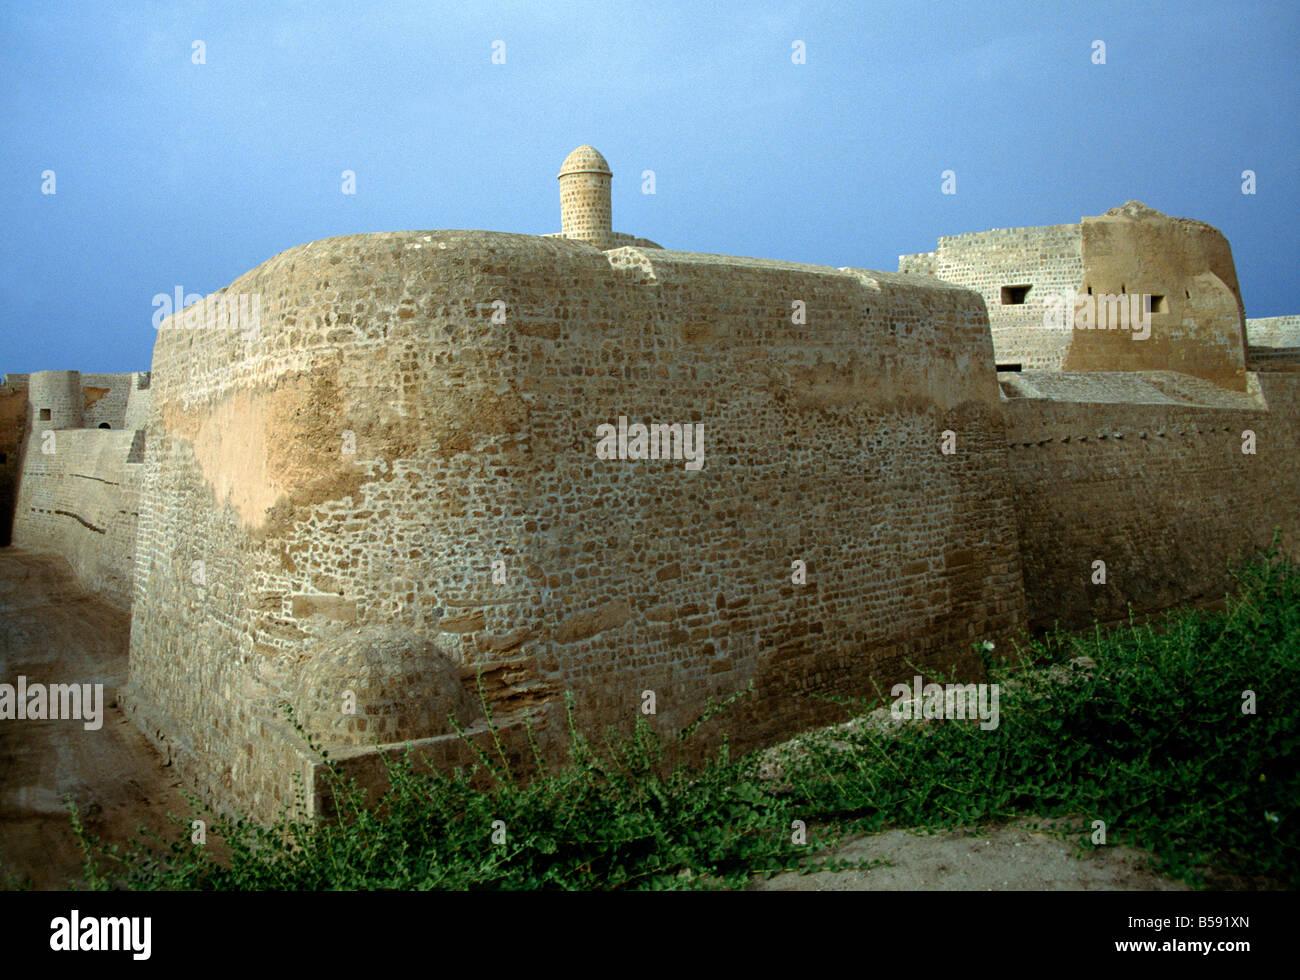 Bahrain Fort Delmon Civilisation 2500bc - Stock Image